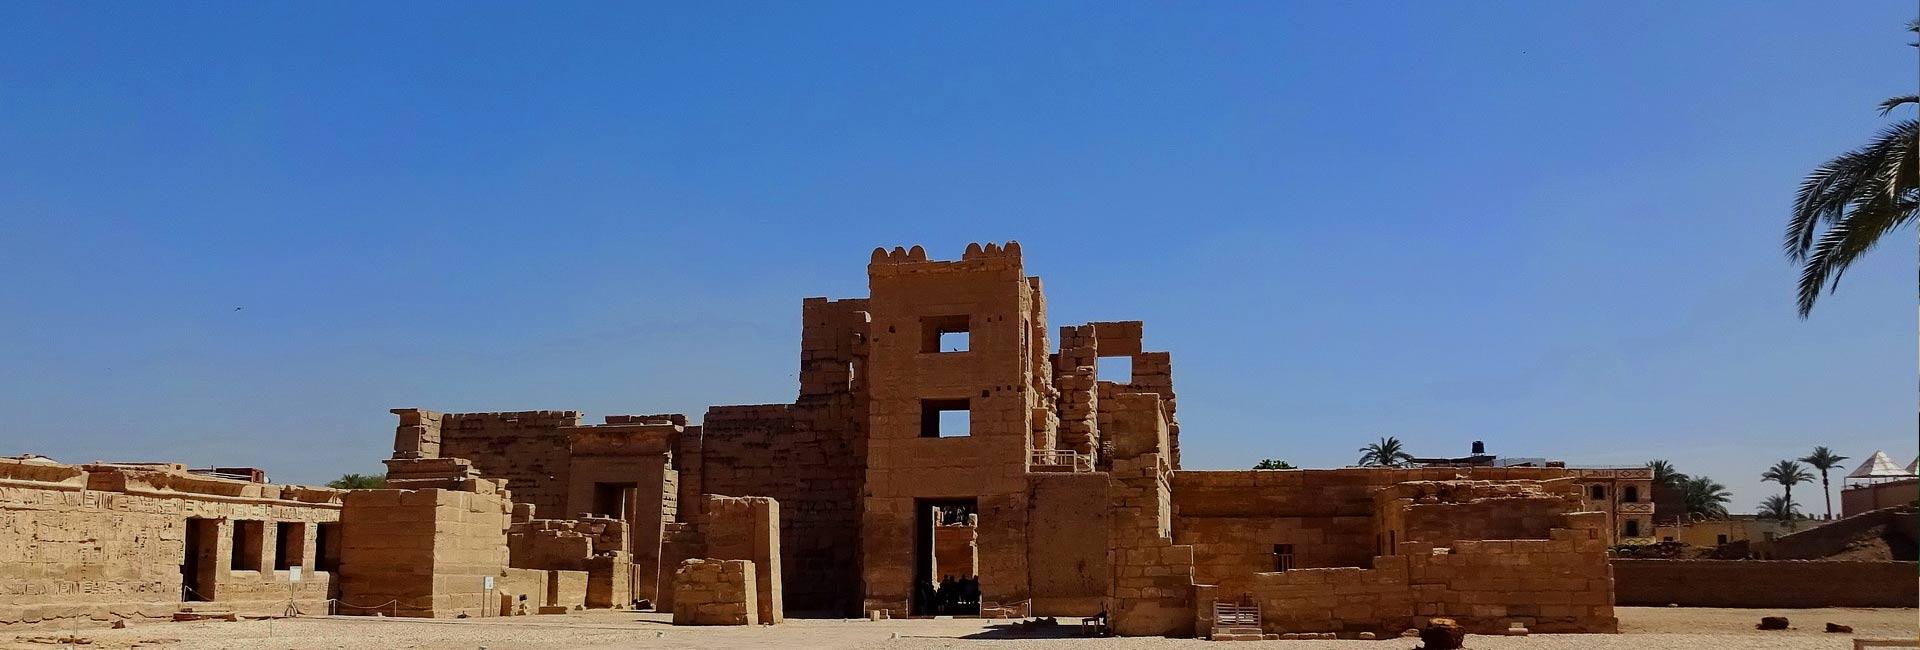 Nile Cruise Luxor To Aswan From Hurghada 5 Day 4 Night